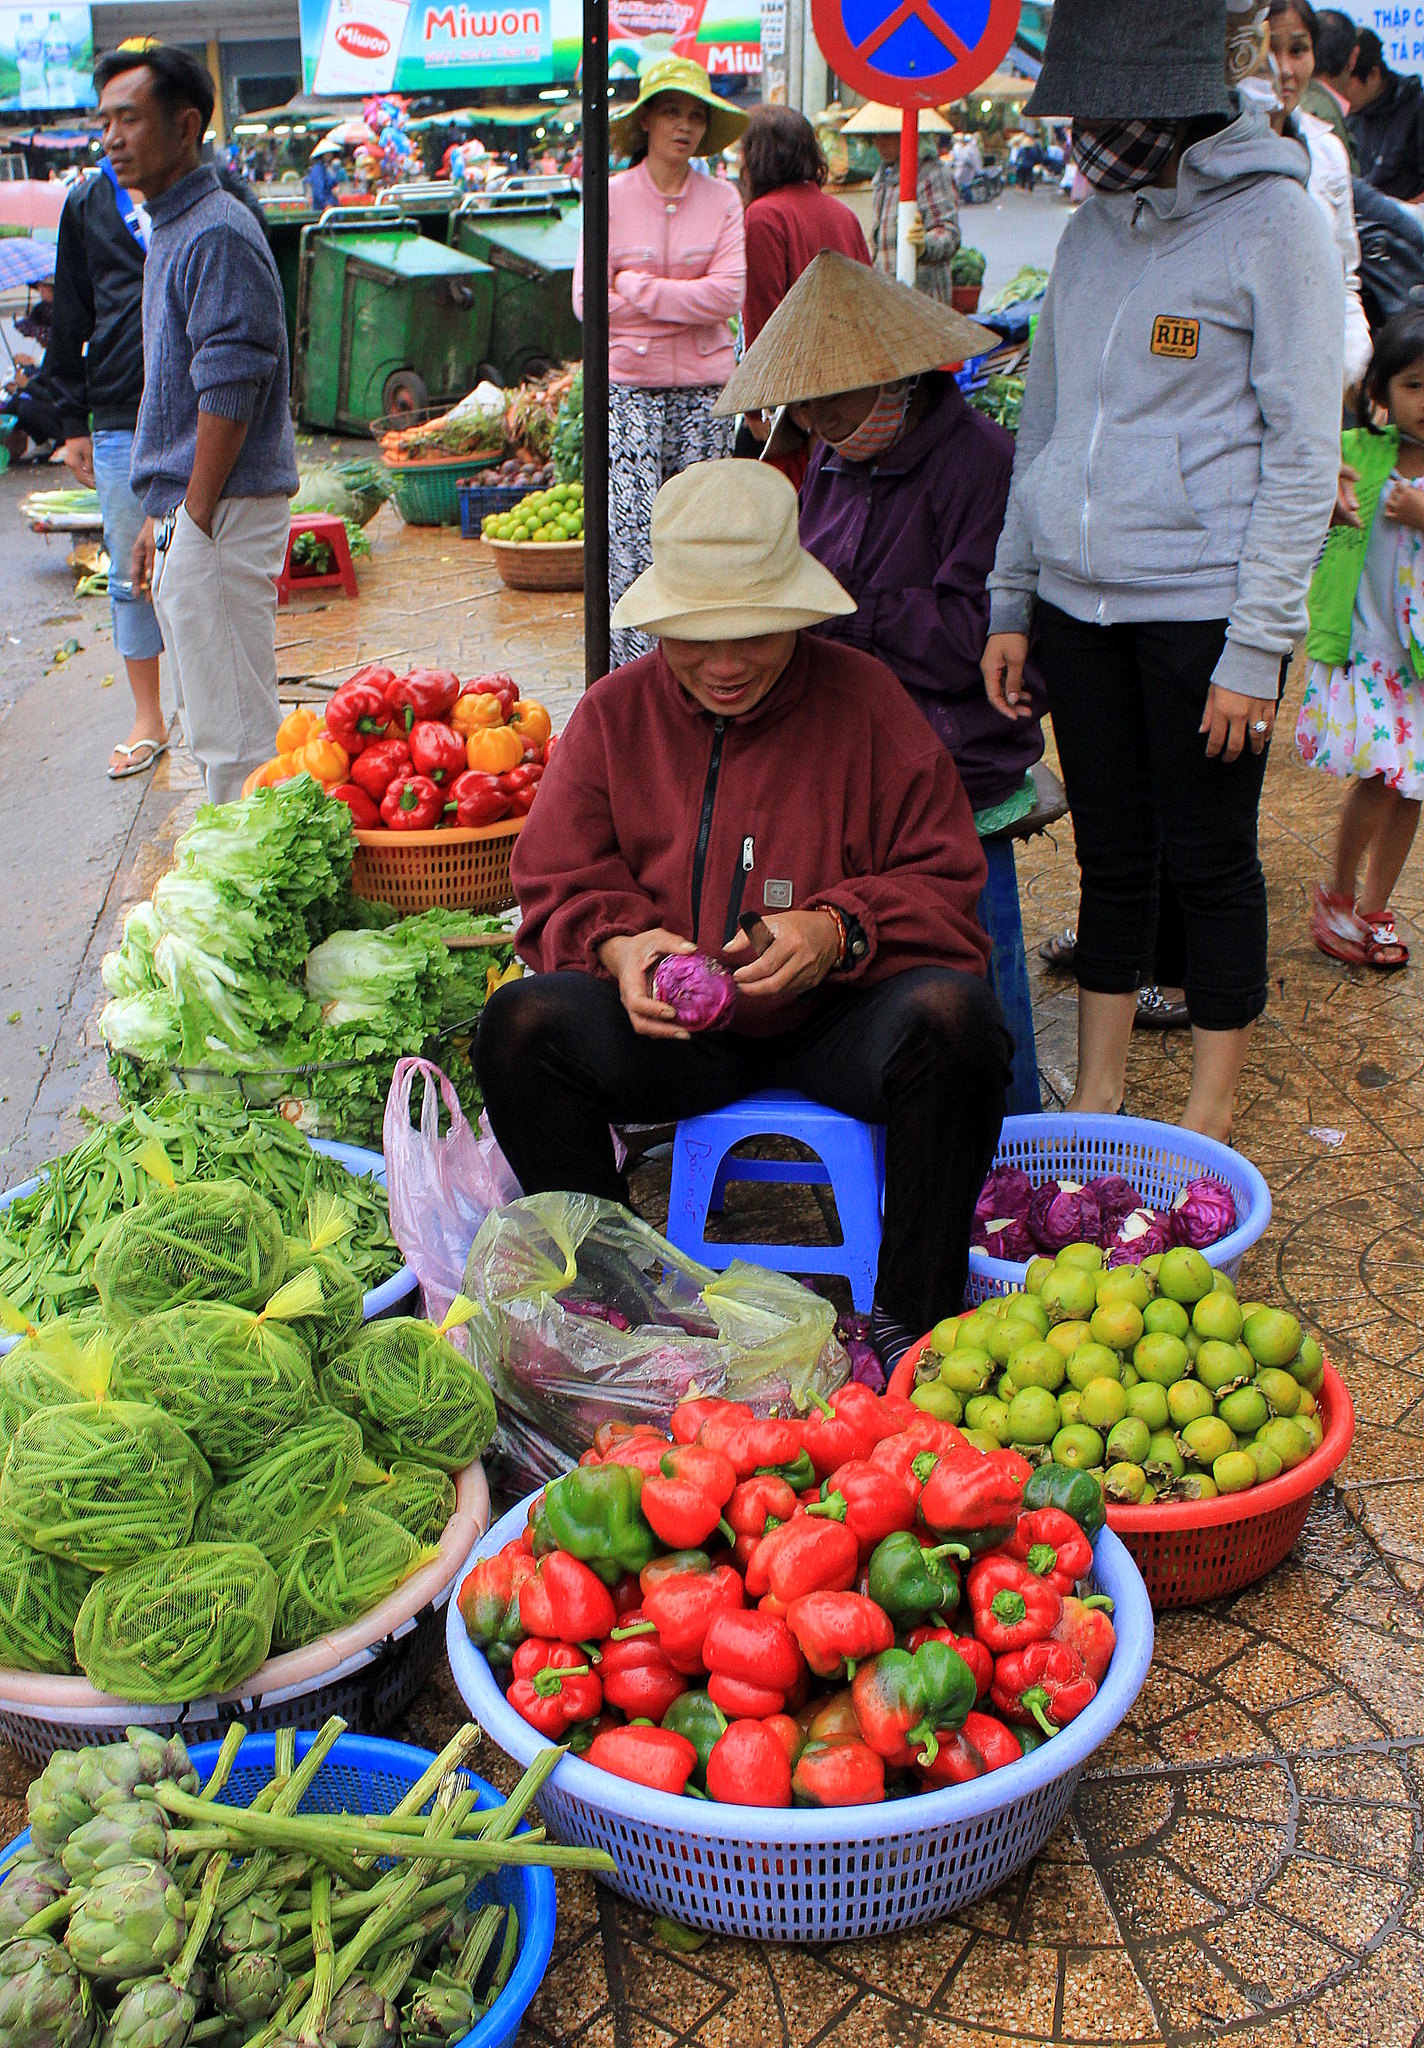 Vietnam trip is an eye opening experience